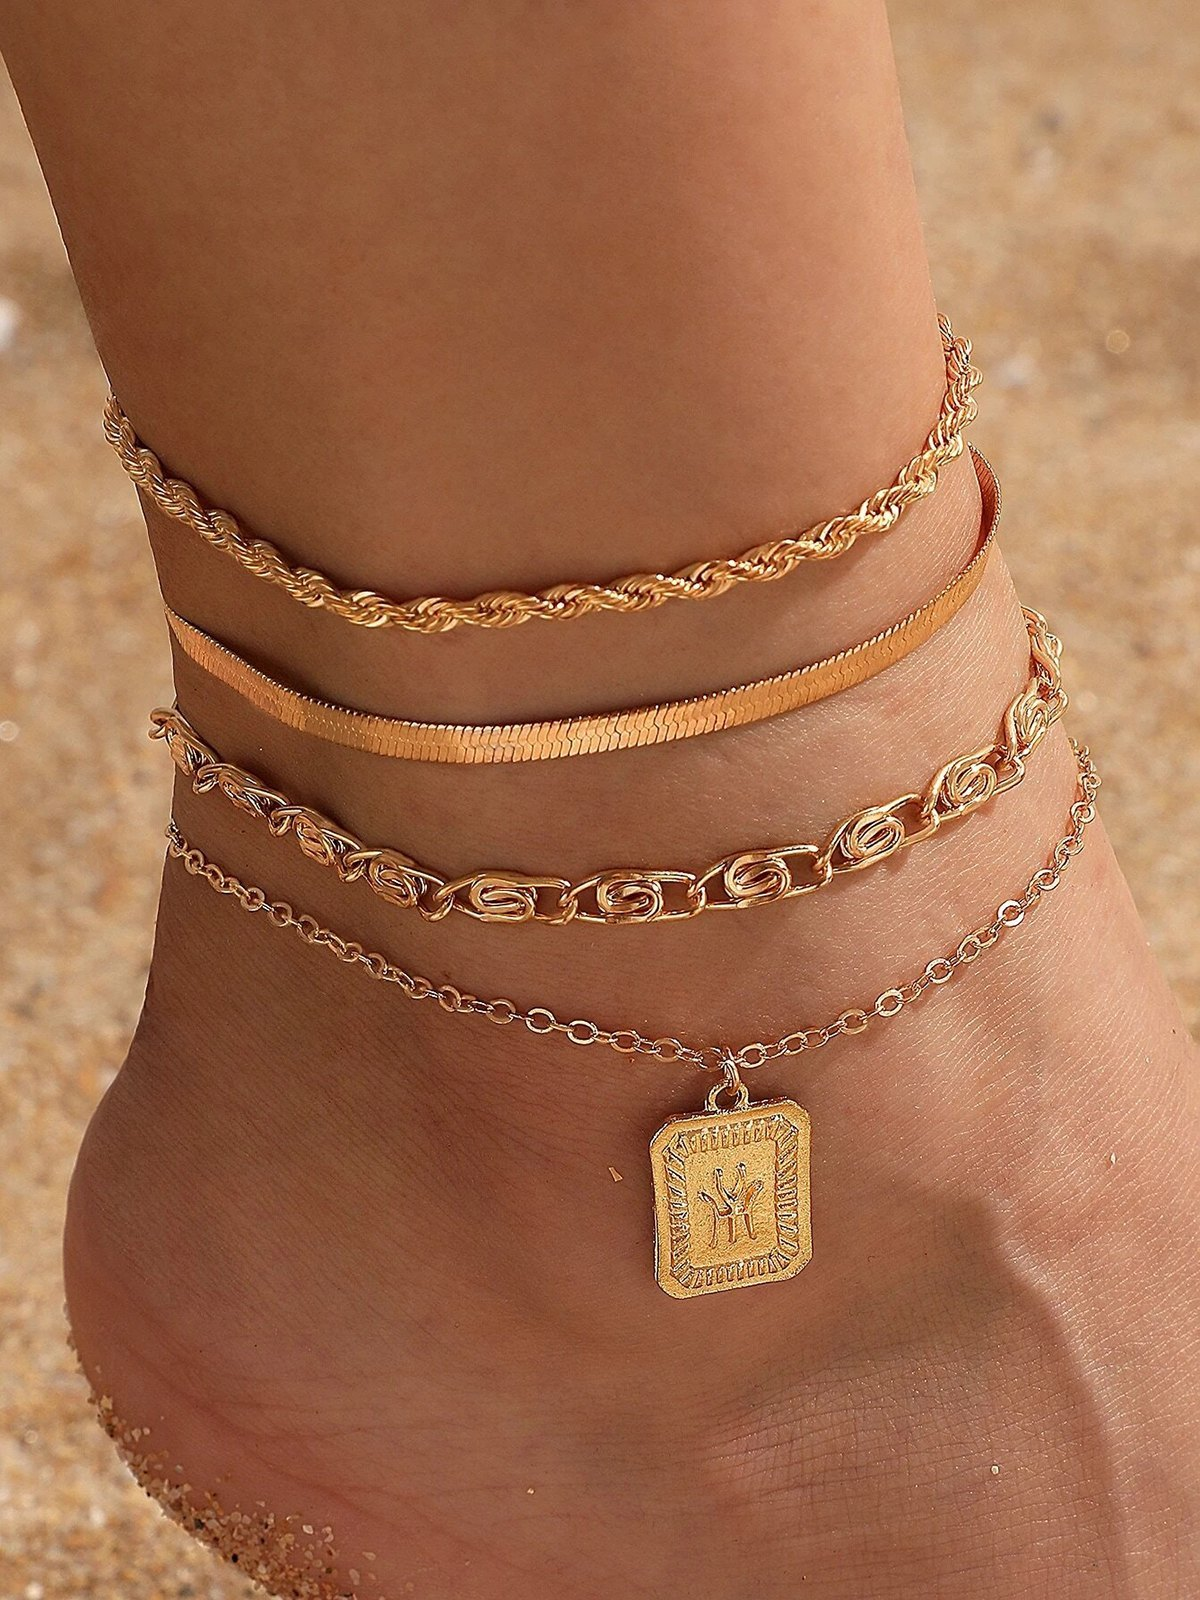 4Pcs Geometric Charm Anklet - Golden ONE SIZE